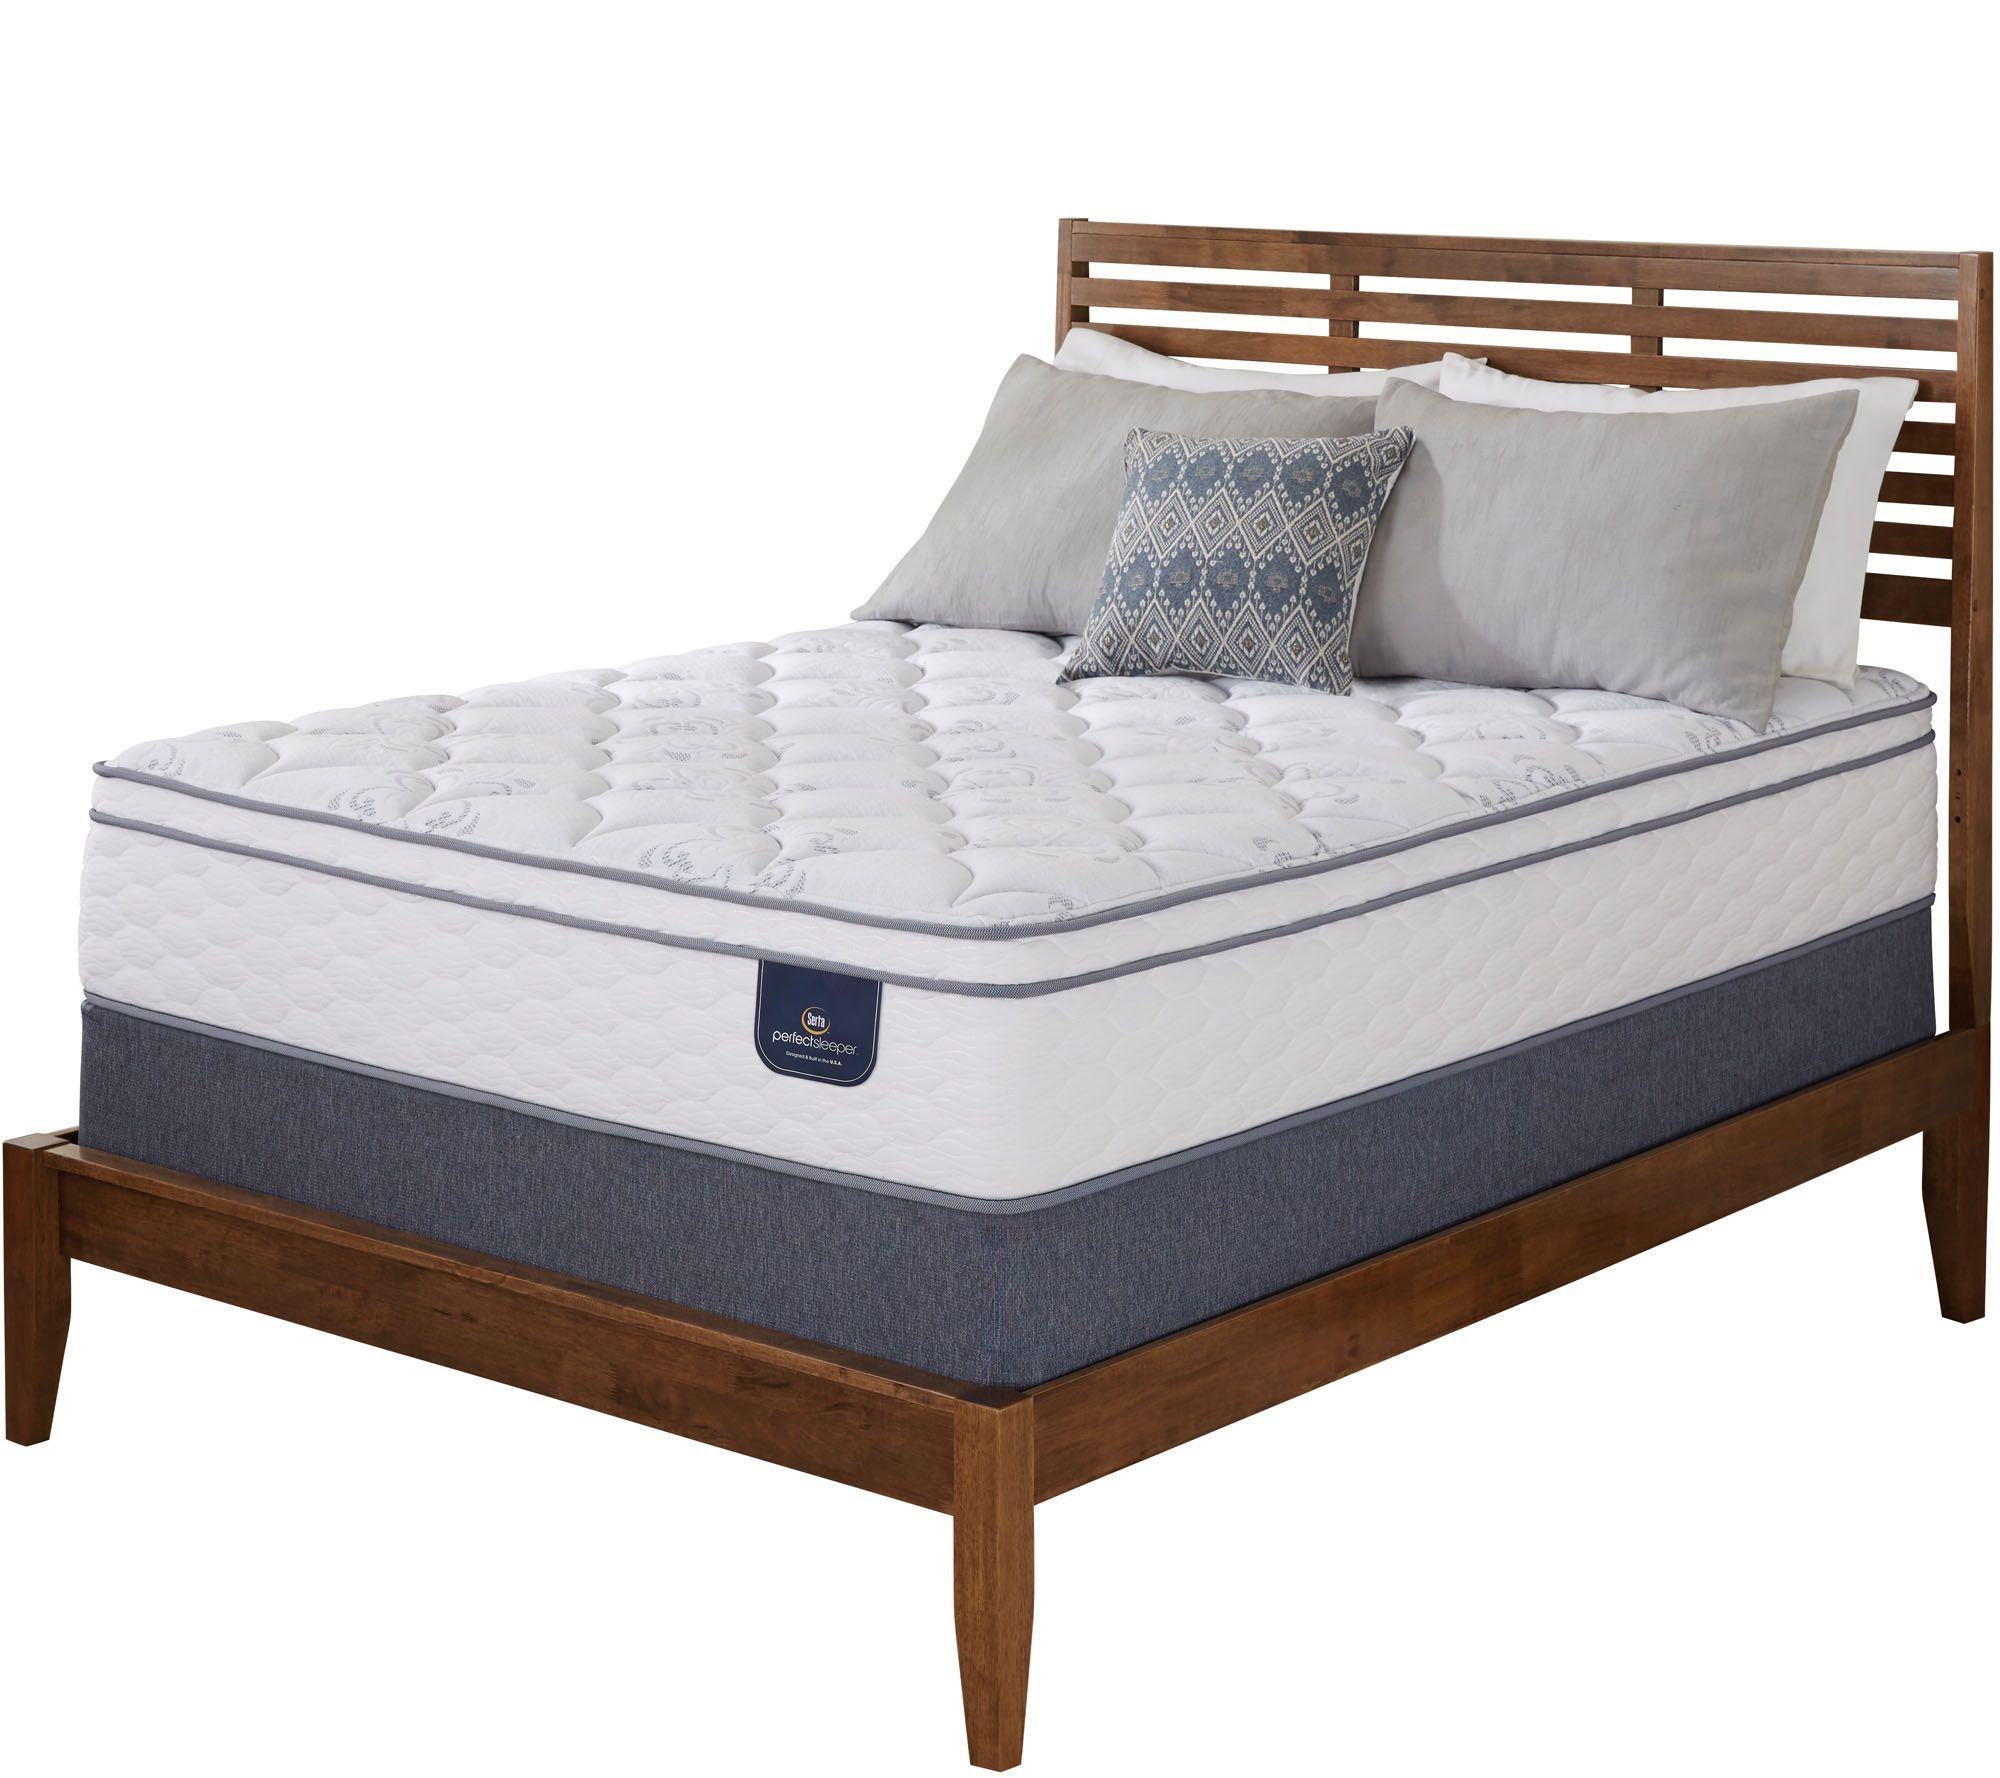 100 home design twin xl mattress pad mattresses u2014 for the home u2014 qvc com full - Home design mattress pads ...